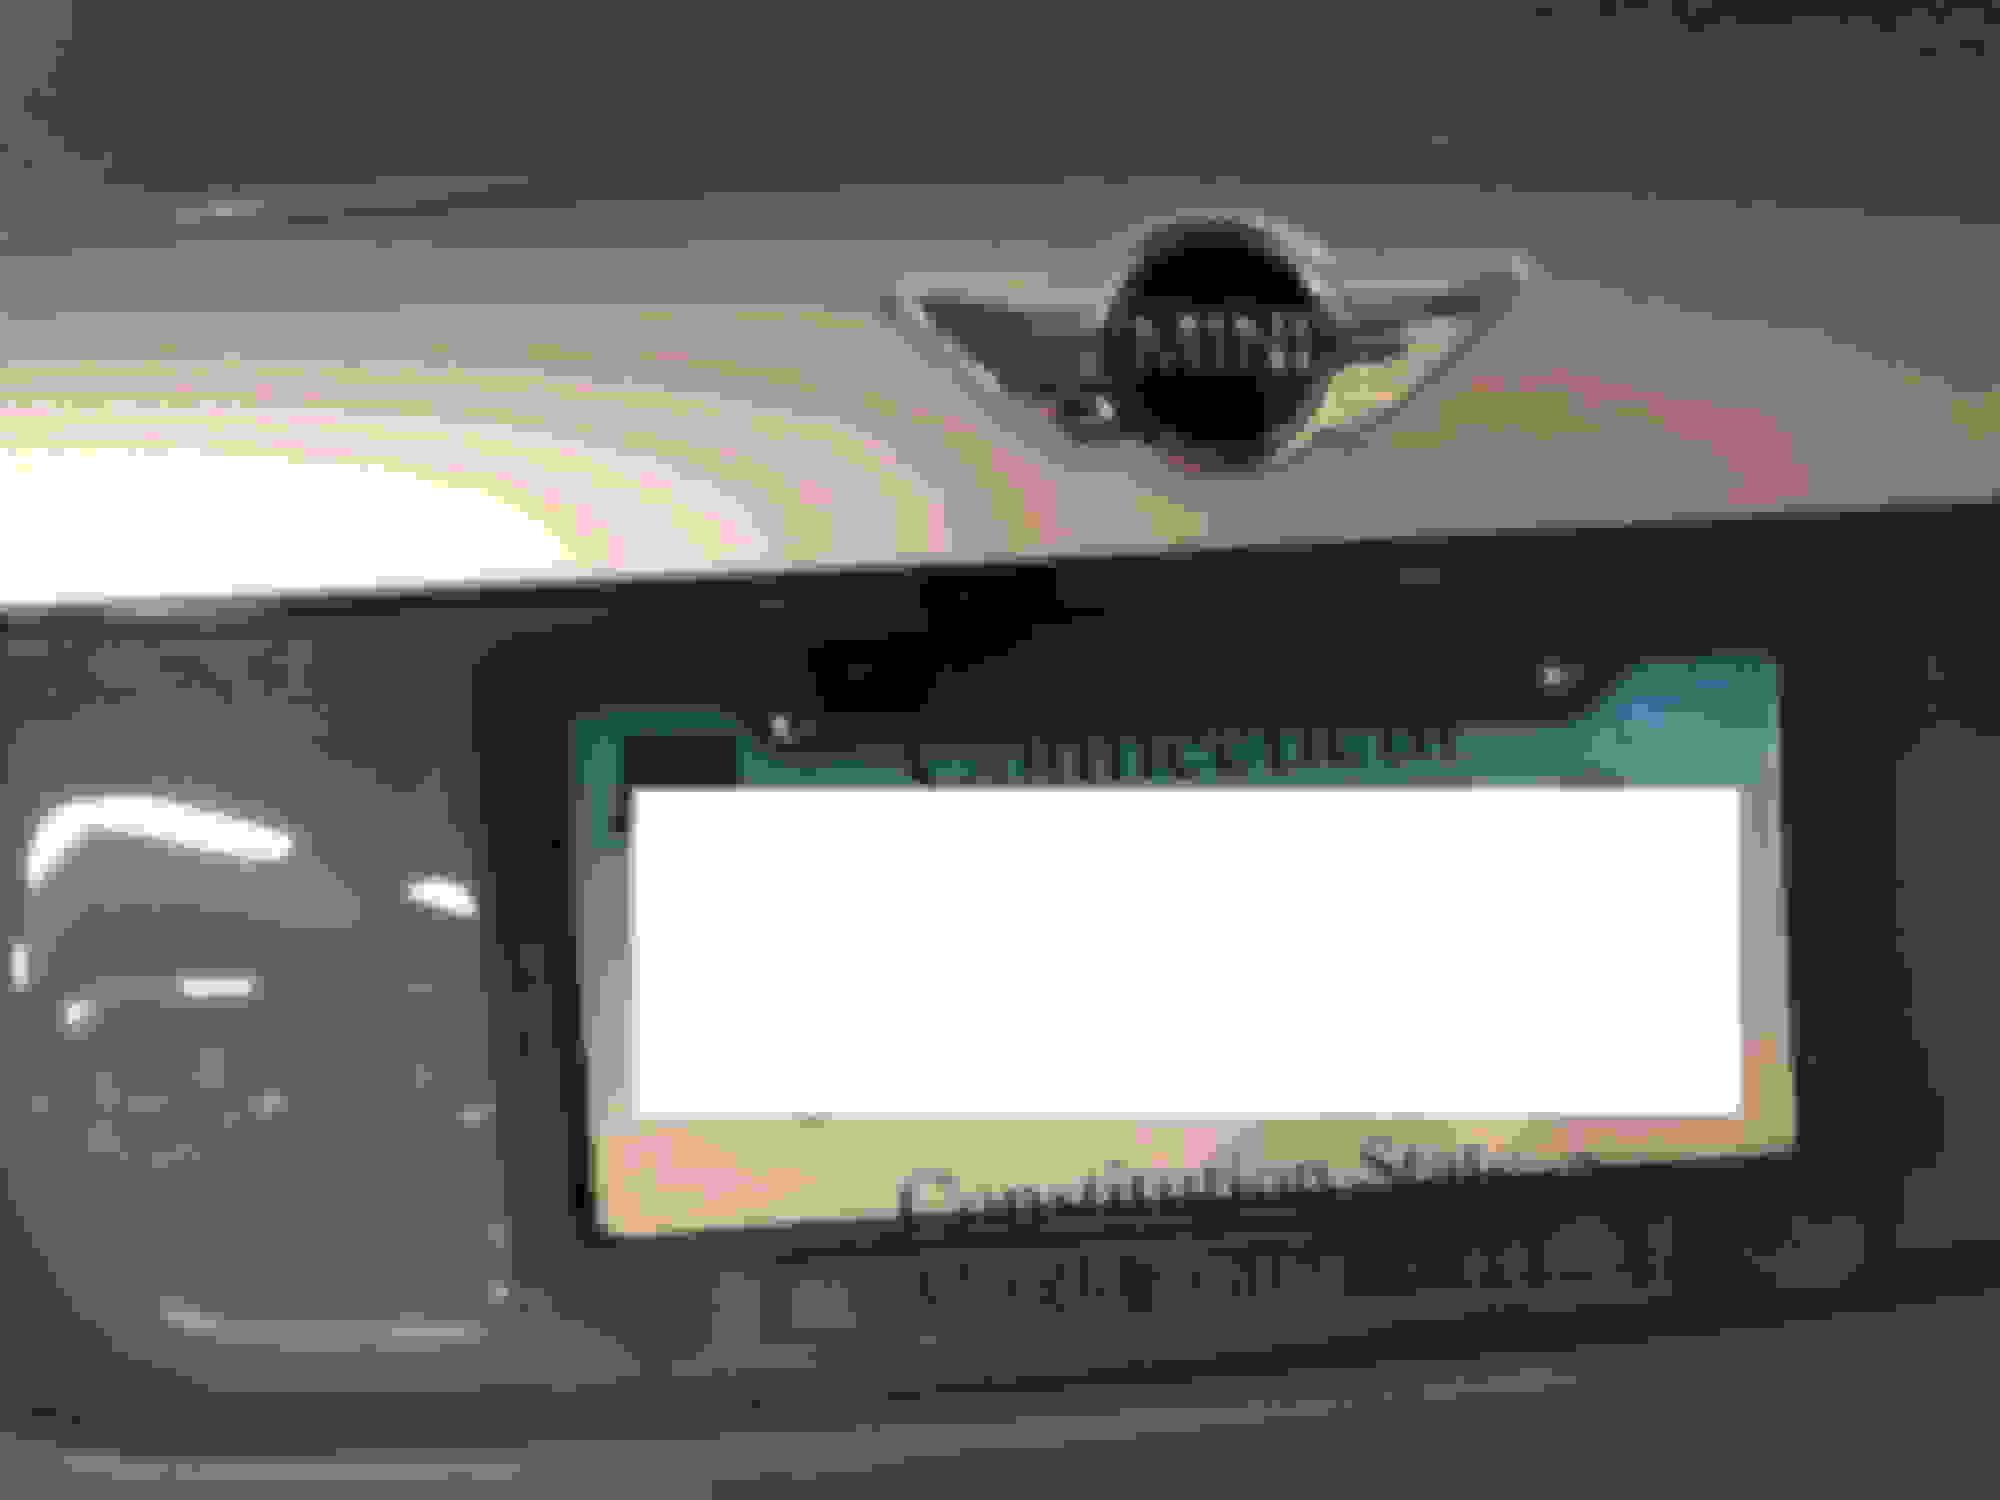 Interior/Exterior PDC (rear) and Backup Camera - North